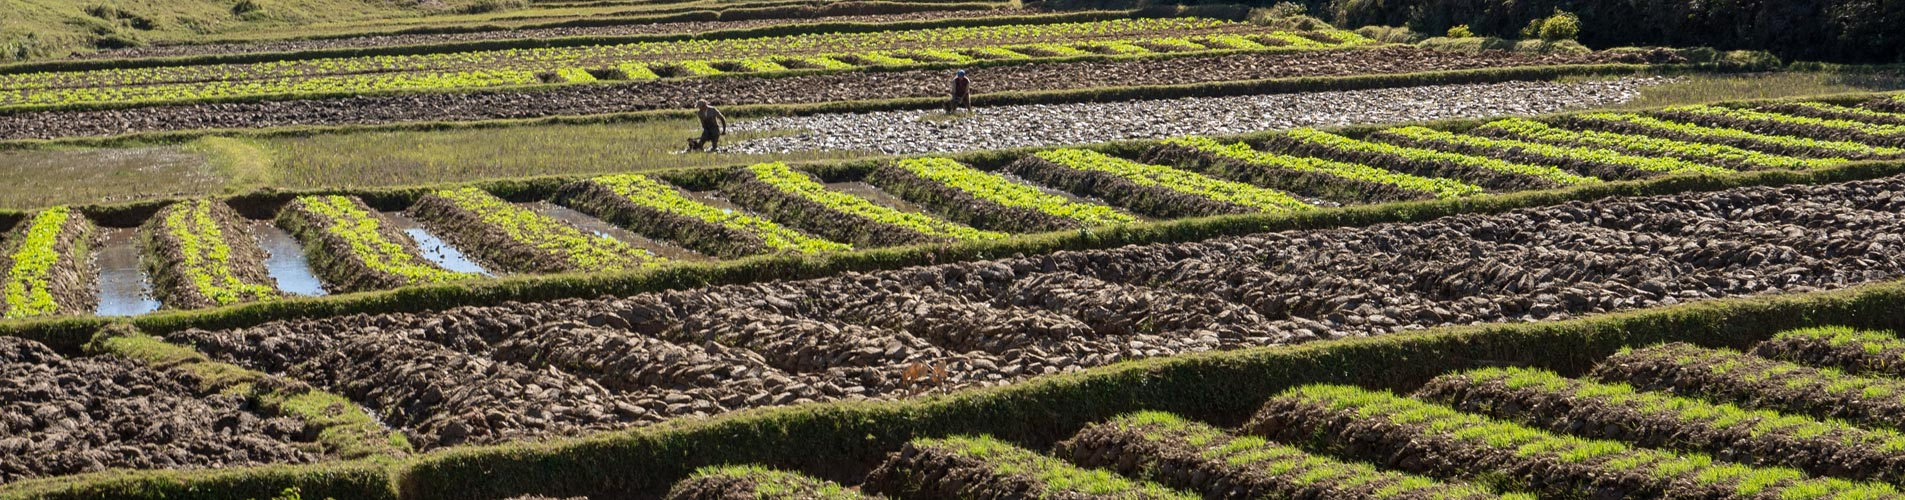 Madagascar Rice Paddies